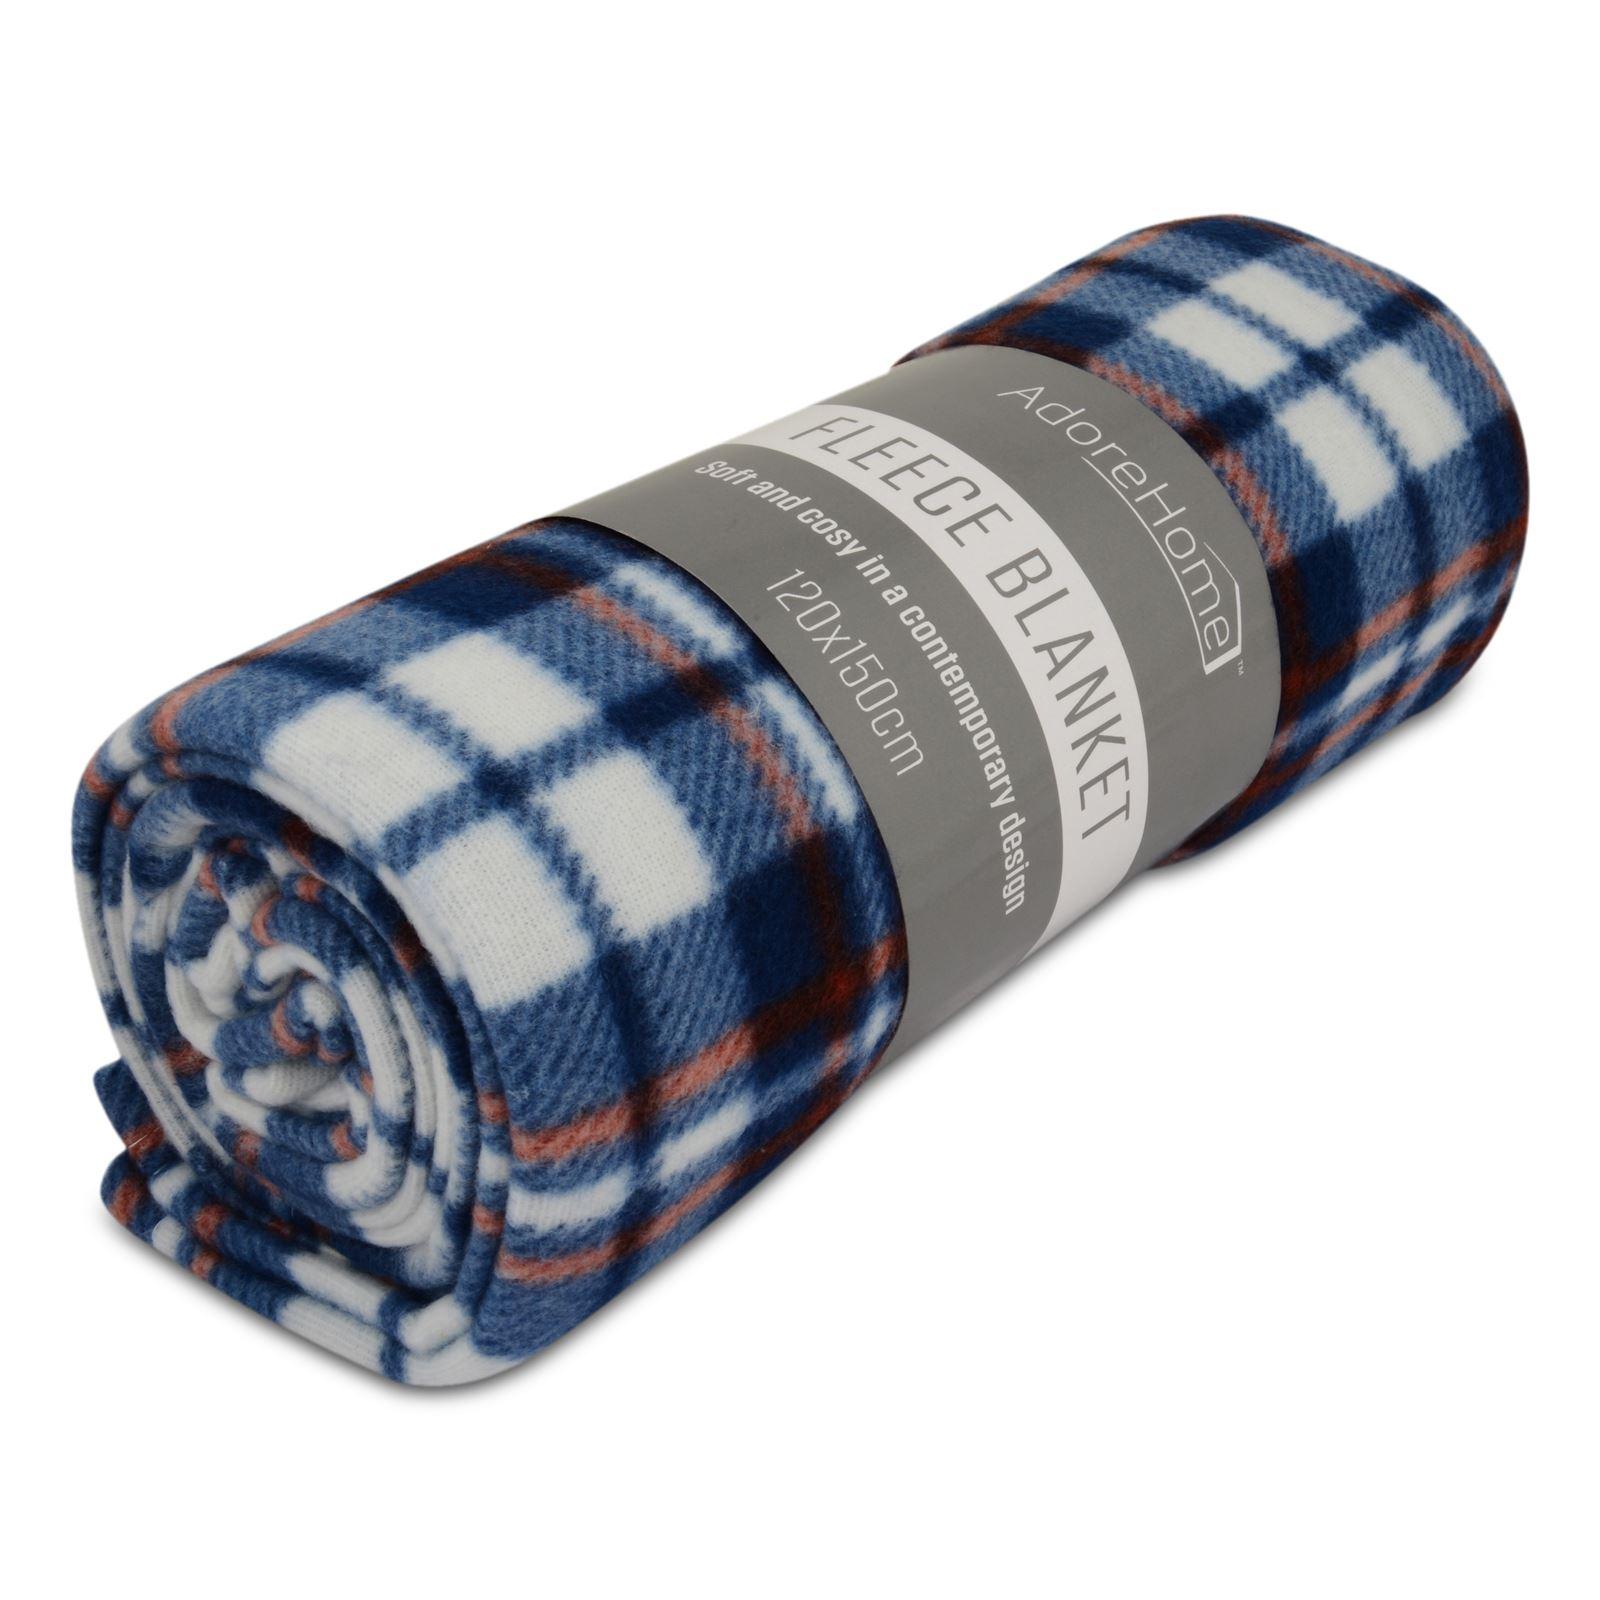 Spartan Fleece Saddle Cover Animal Print: Soft & Warm Printed Fleece Blankets For Sofa Bed Travel